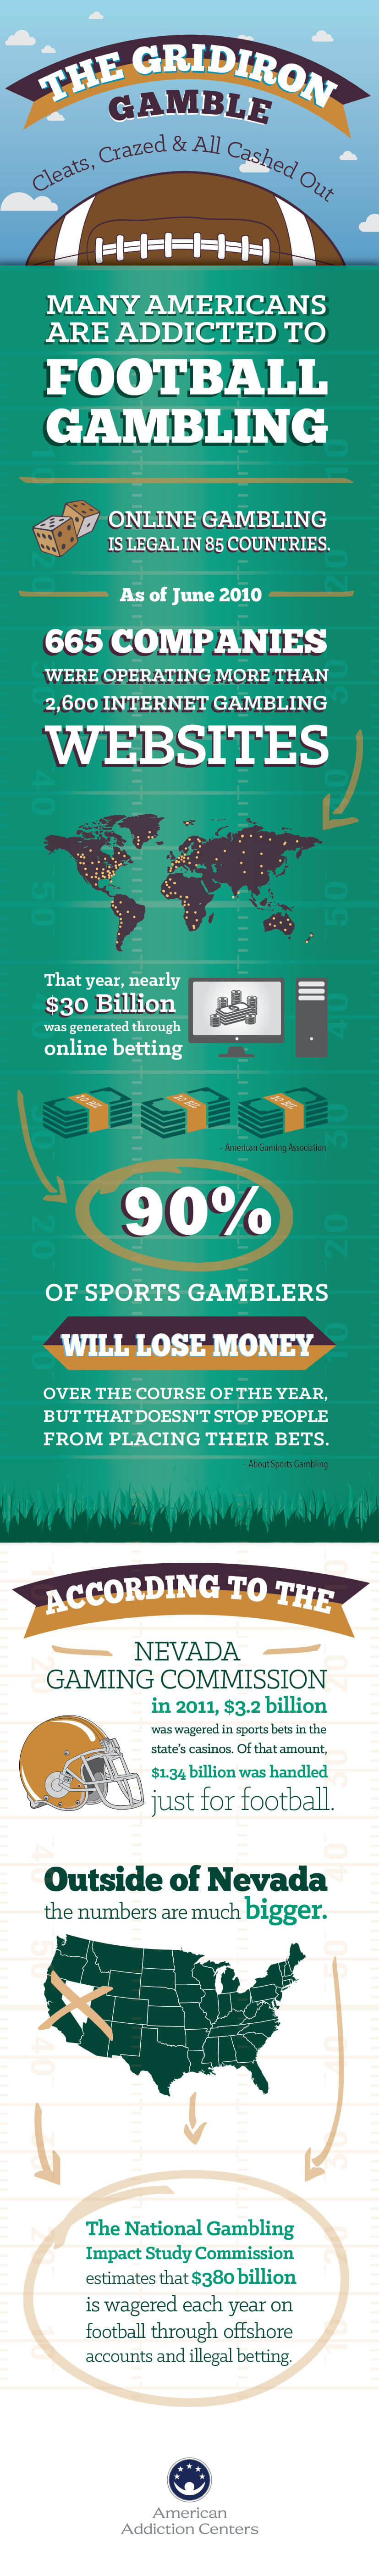 nfl_gambling_web